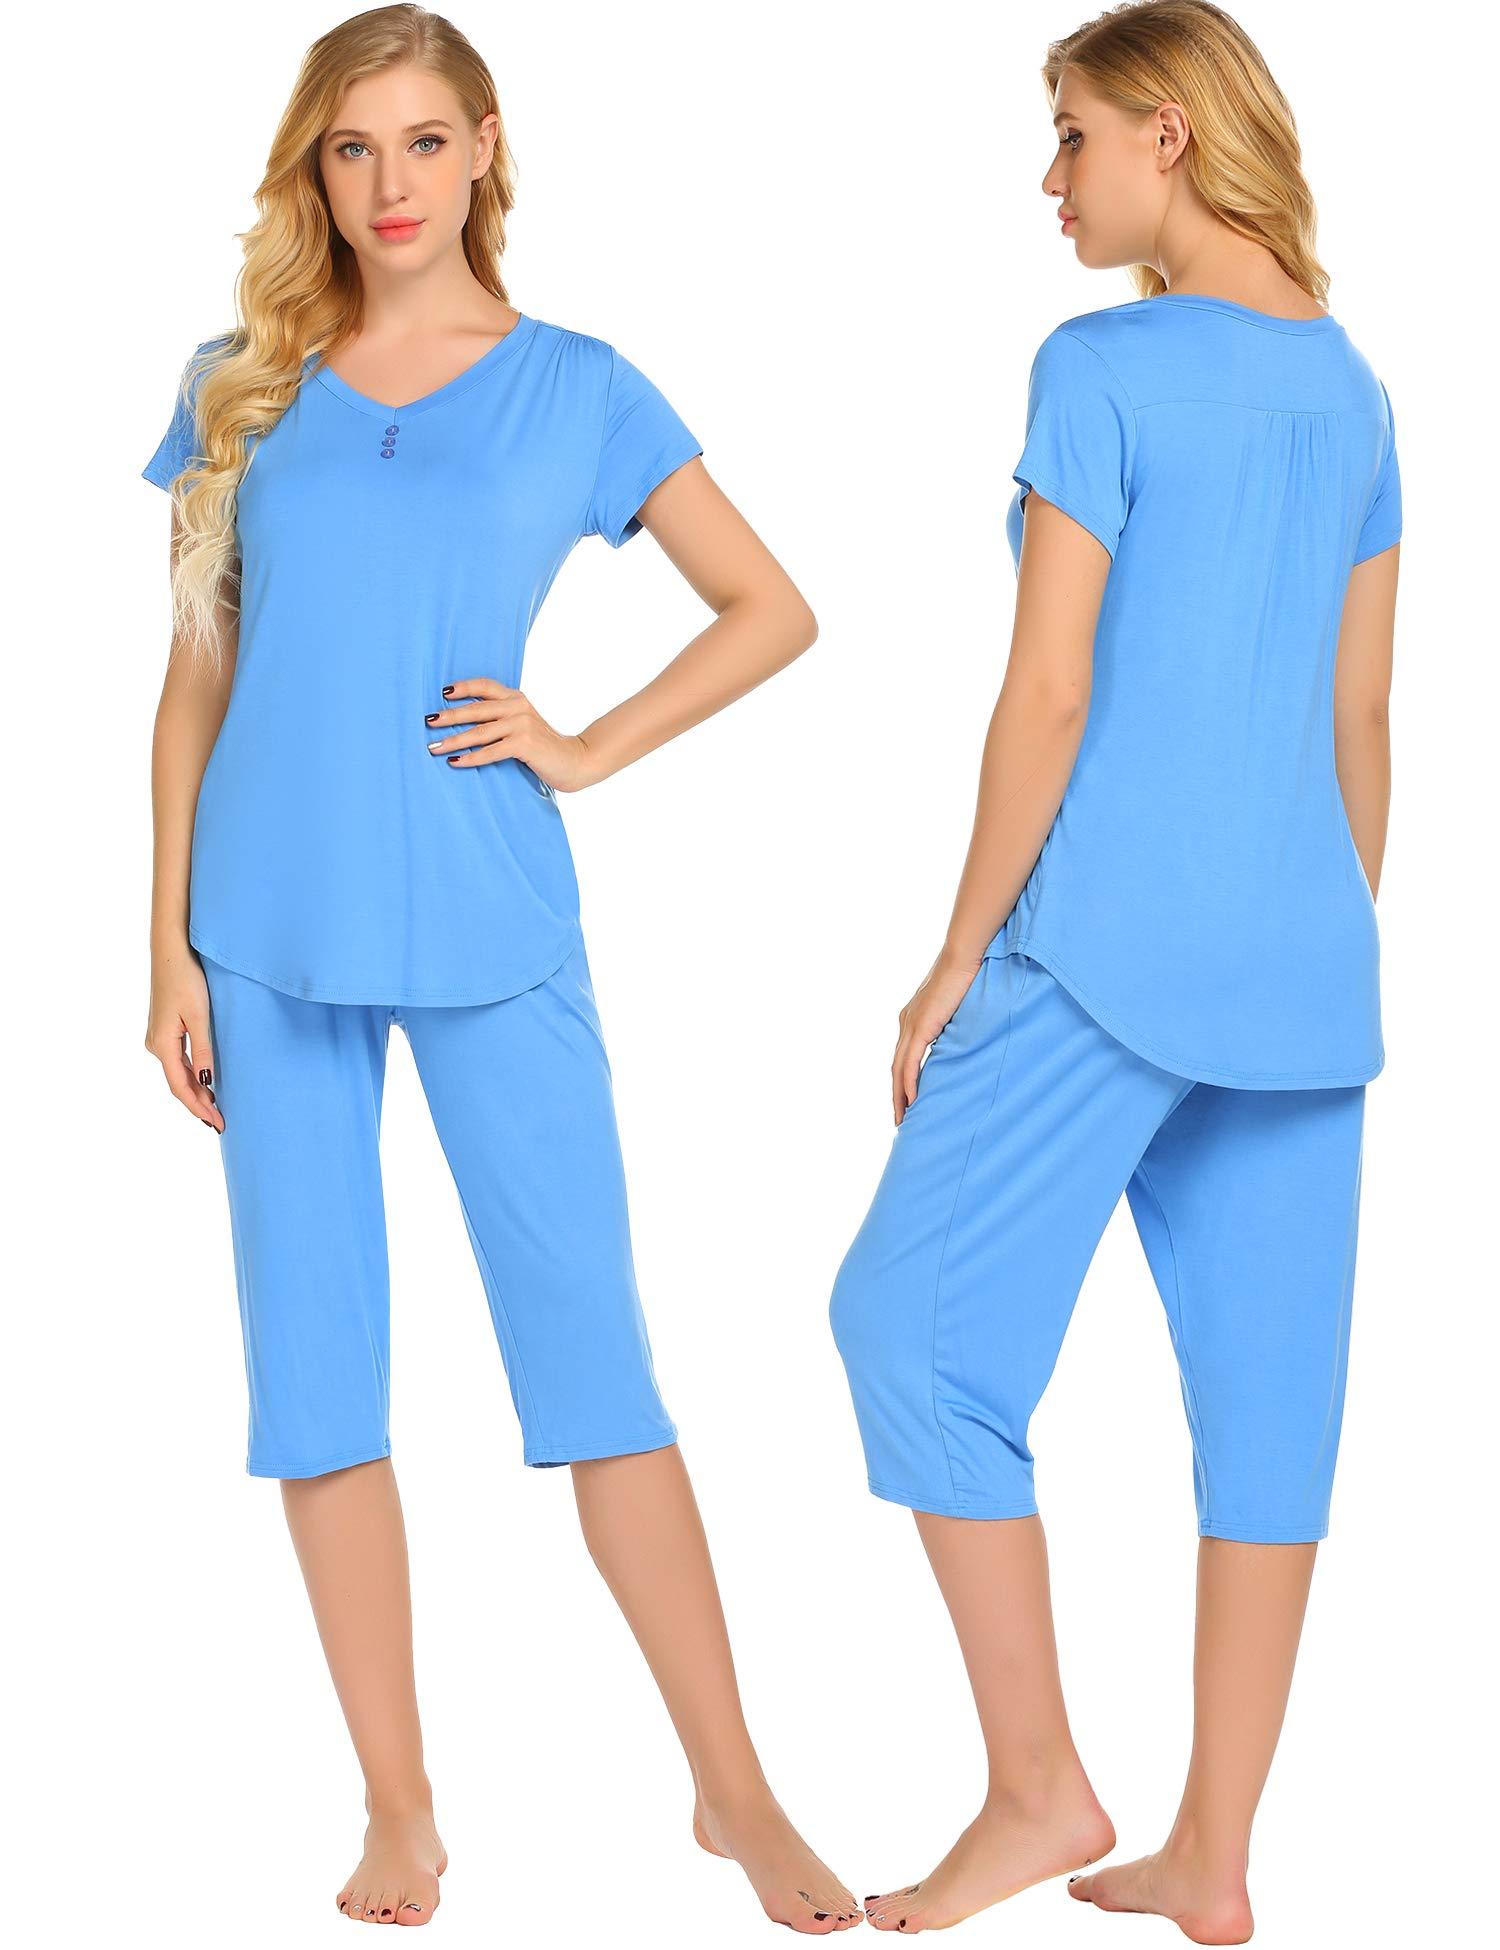 Ekouaer Plus Size Loungewear Women's Pjs Set Short Sleeve Top & Calf Length Pants Sleepwear Pajama Plus Size S-XXL